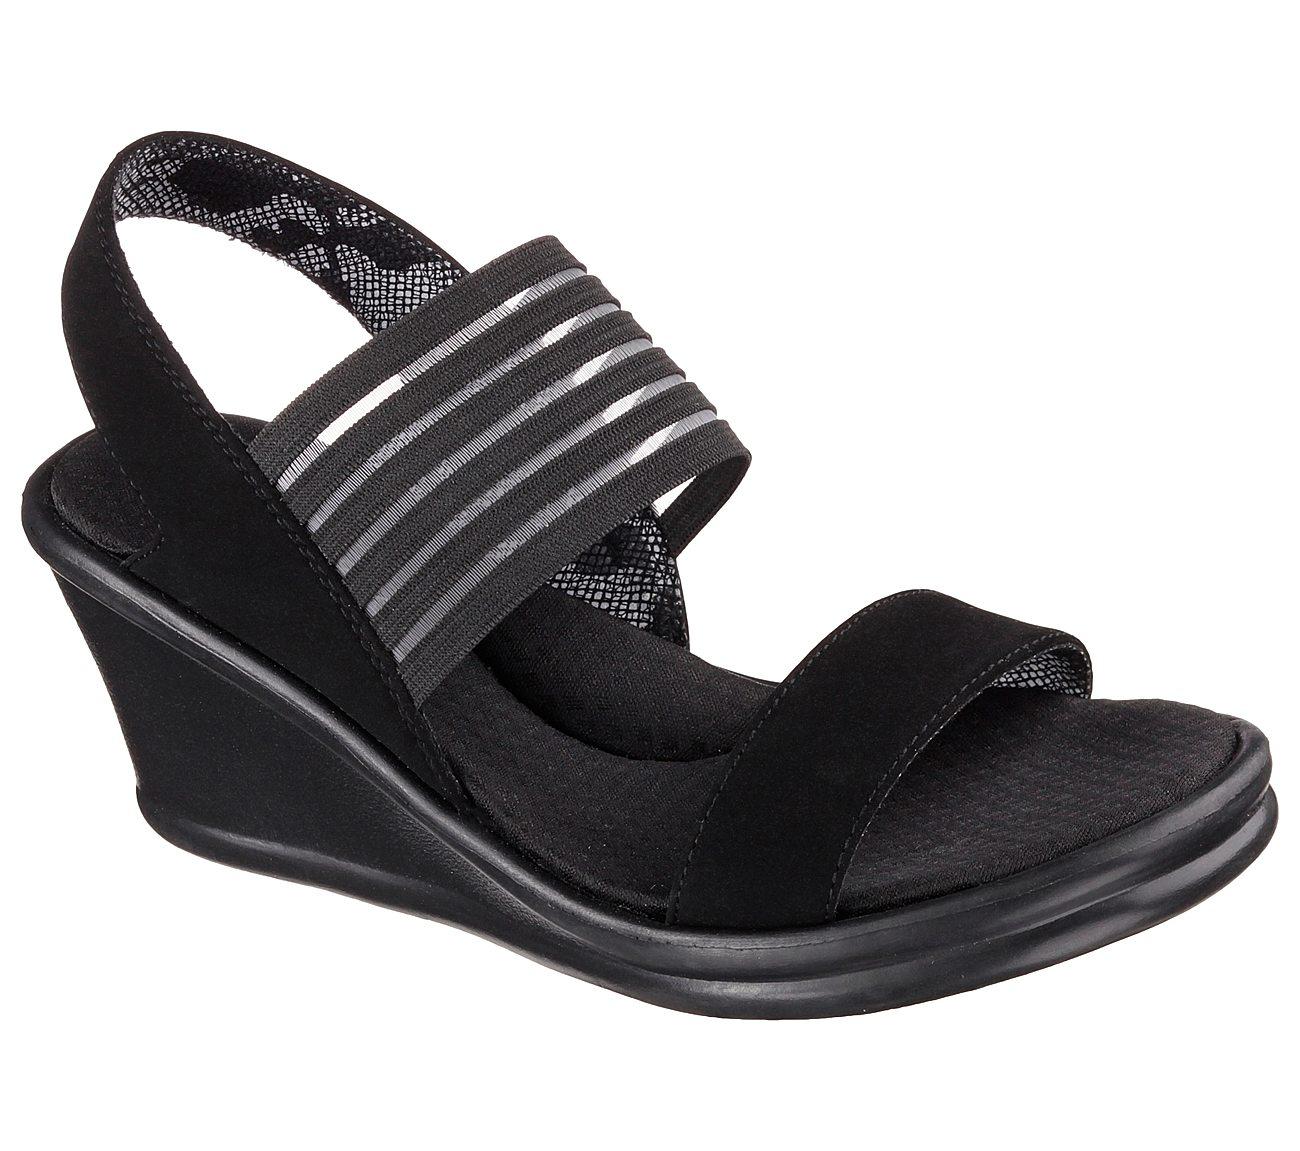 cf64850d0b2c Buy SKECHERS Rumblers - Sci Fi Cali Shoes only  58.00